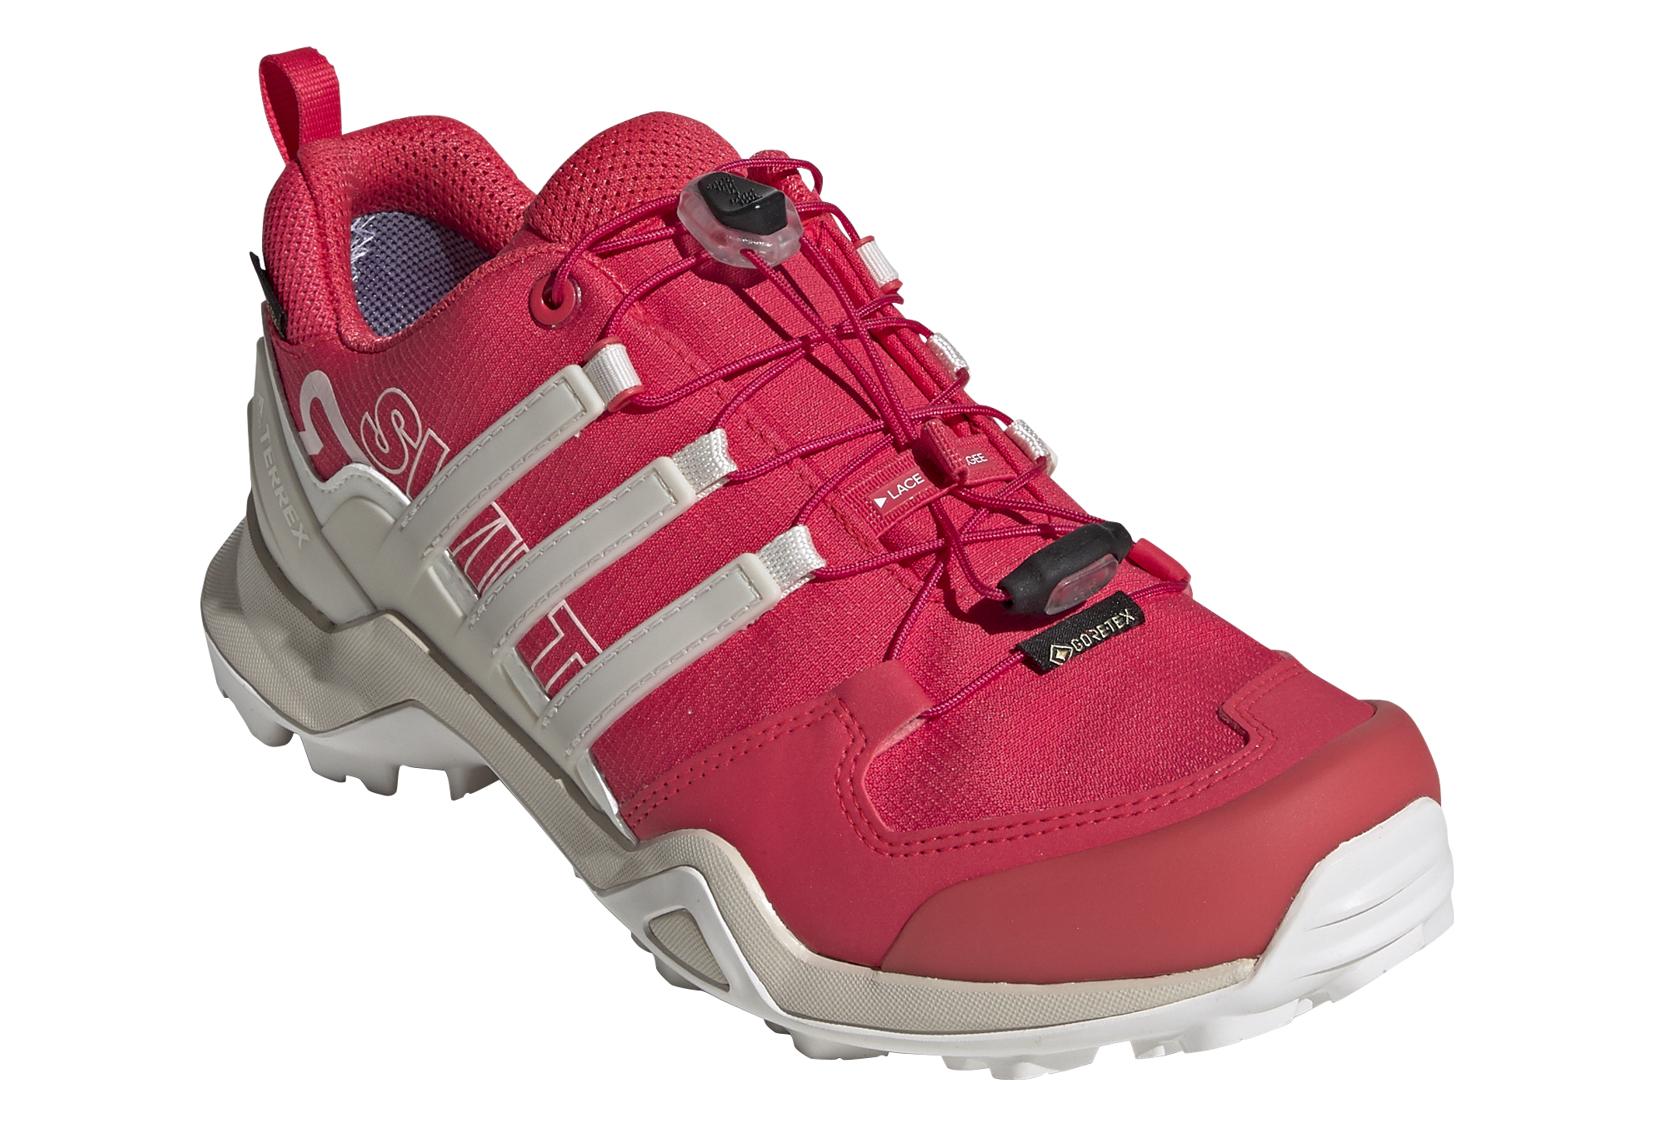 Swift Terrex Chaussures Adidas Gtx Femme R2 3q5jAcLR4